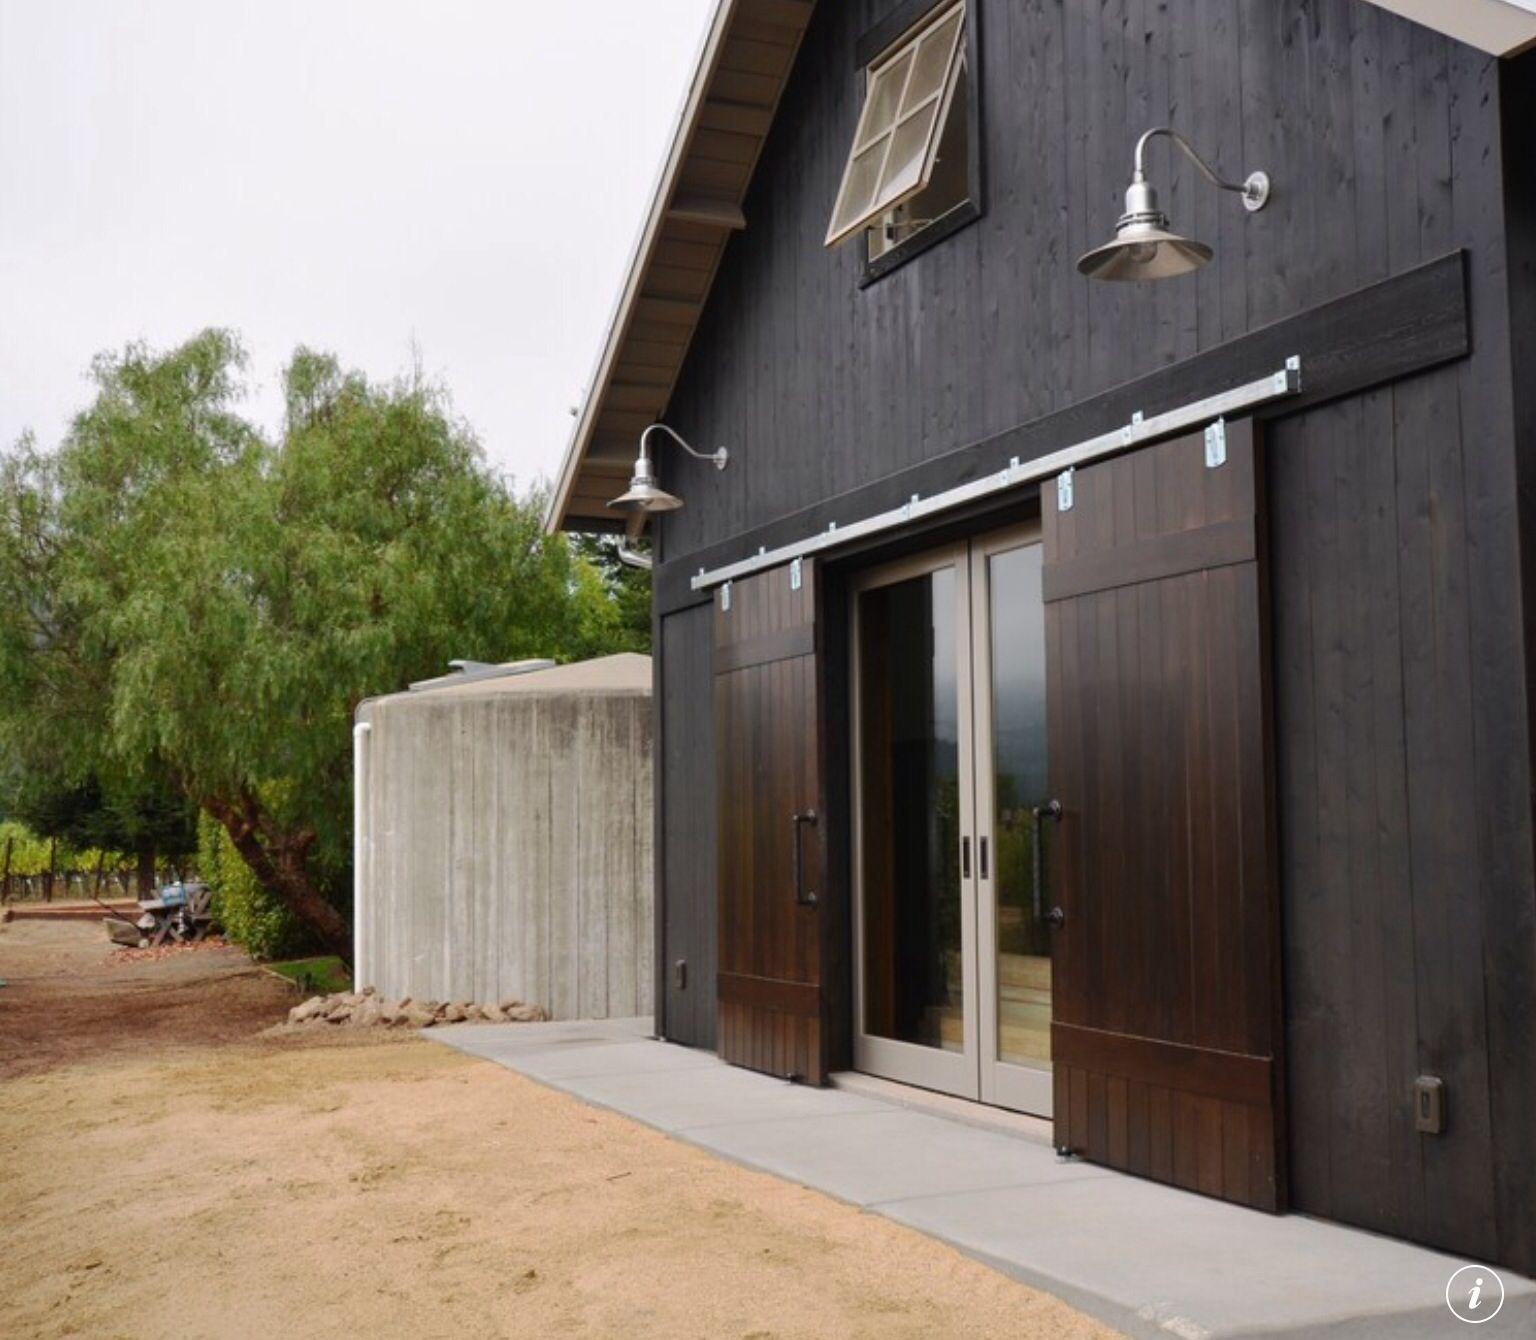 Black Barn Glass Doors Exterior Sliding Barn Doors Exterior Barn Doors Modern Barn House